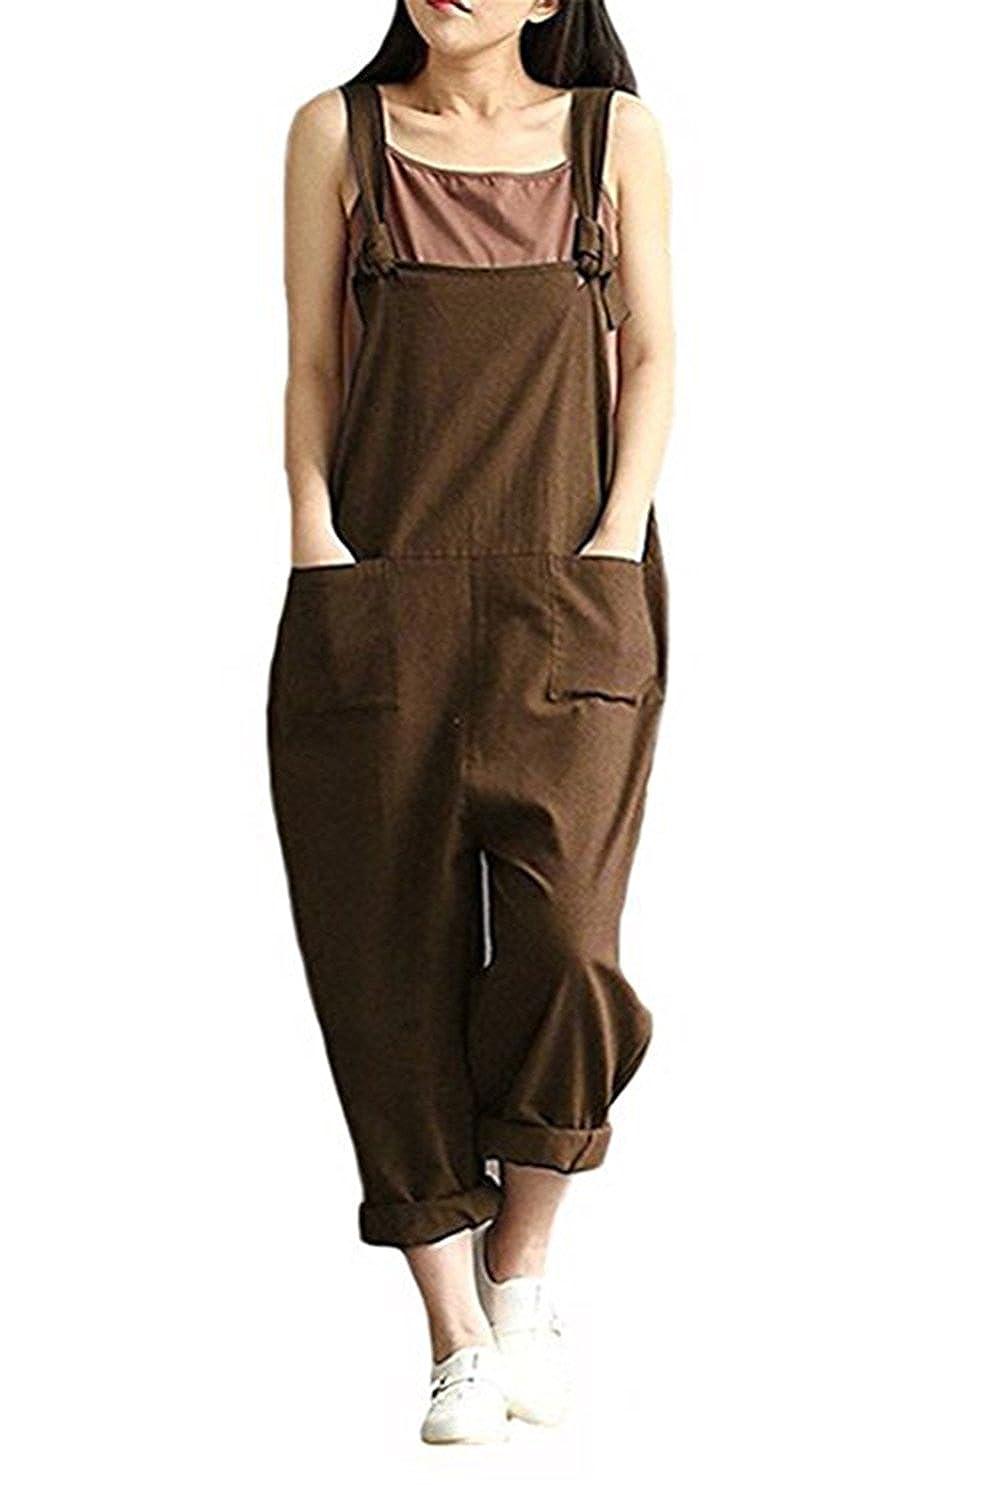 536b8890557 Top 10 wholesale Jumpsuit Plus Size Clothing - Chinabrands.com